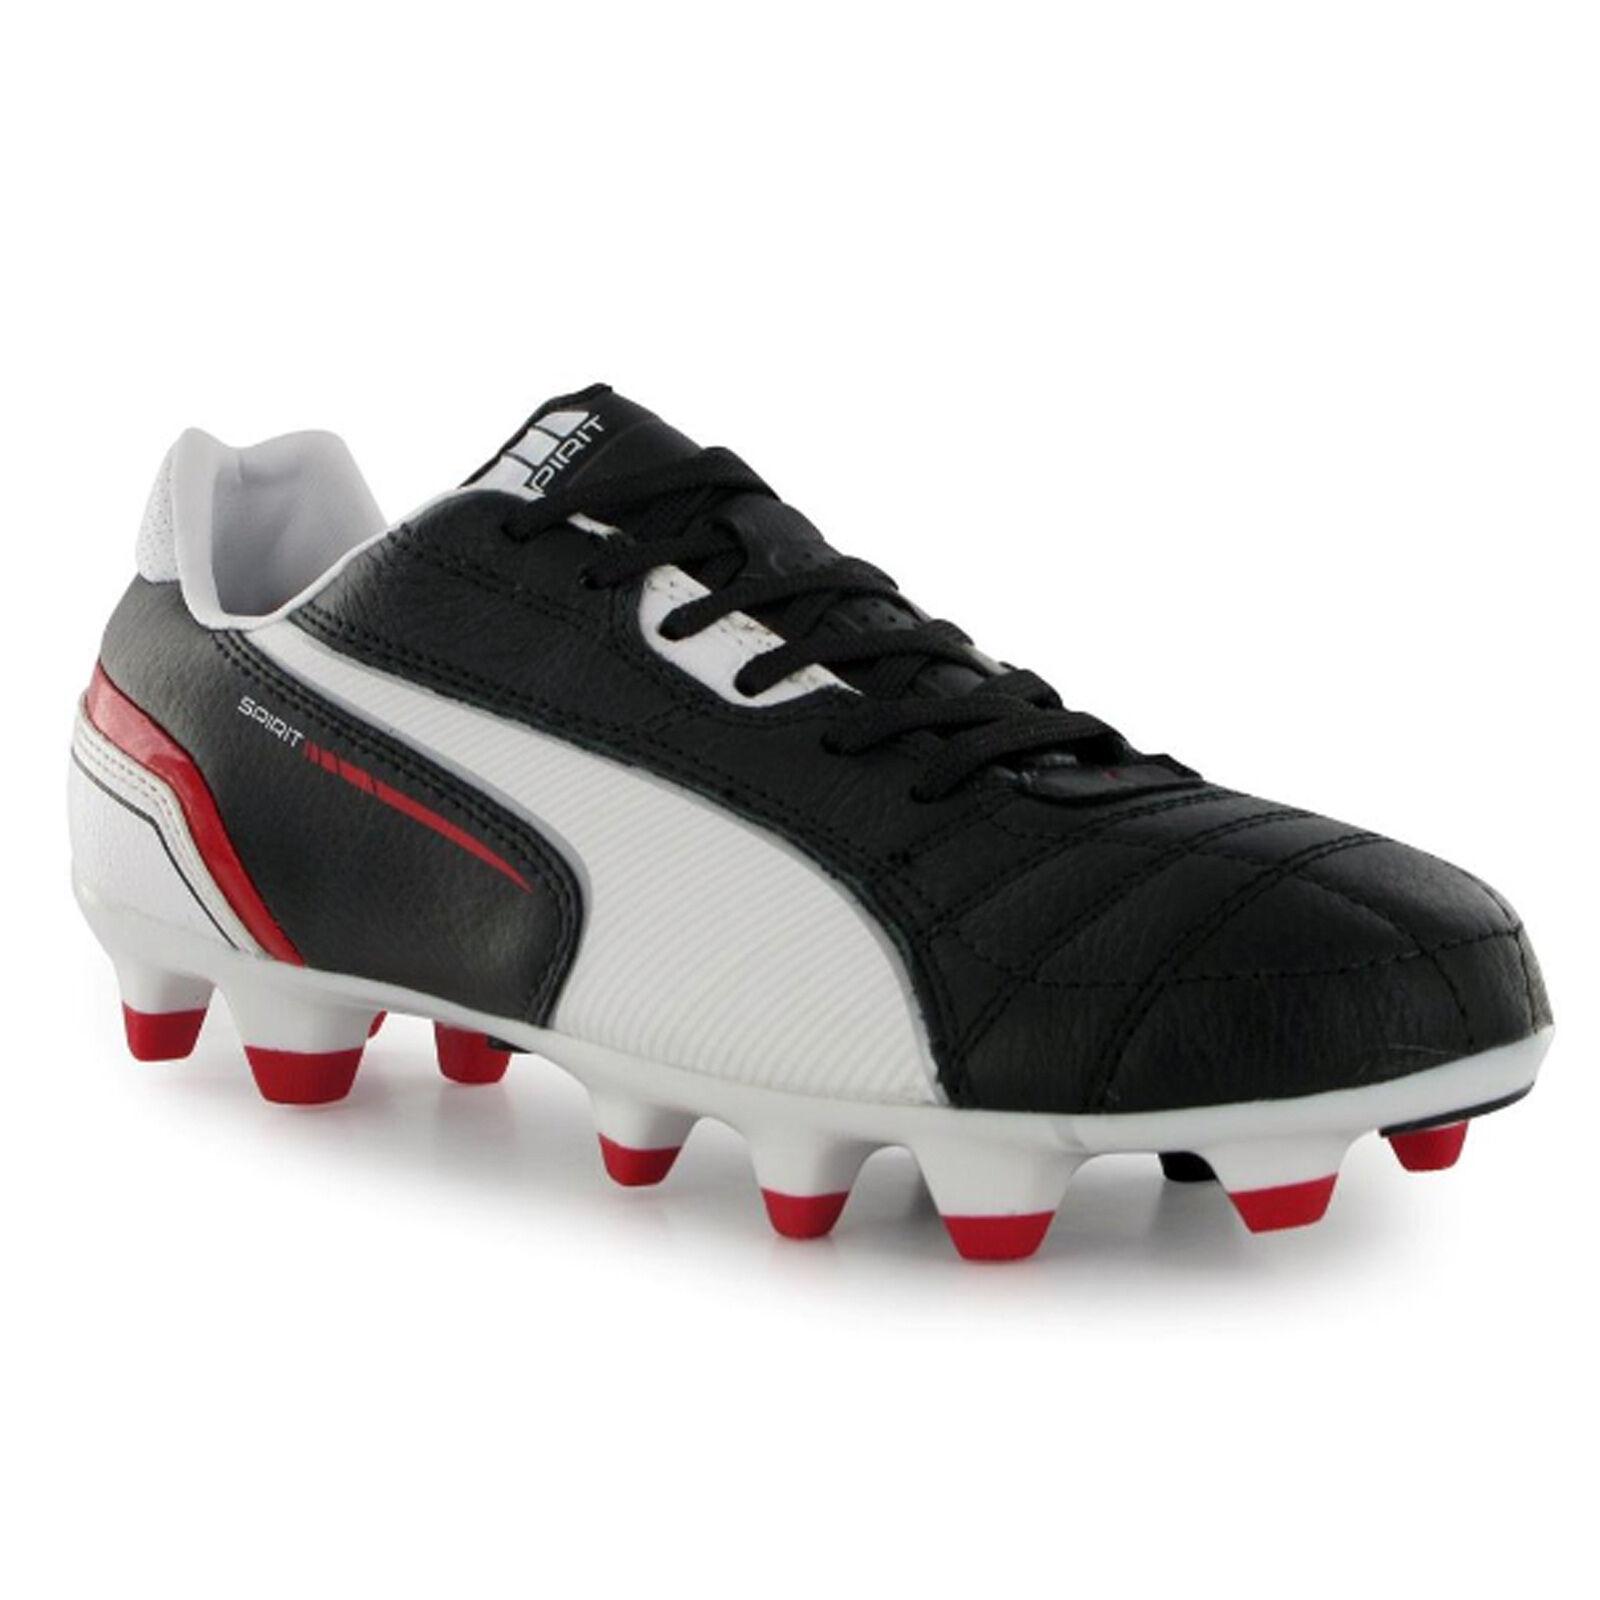 b0c9c9ffbcd4 Details about Puma Spirit FG Junior Kids Football Boots Shoes New